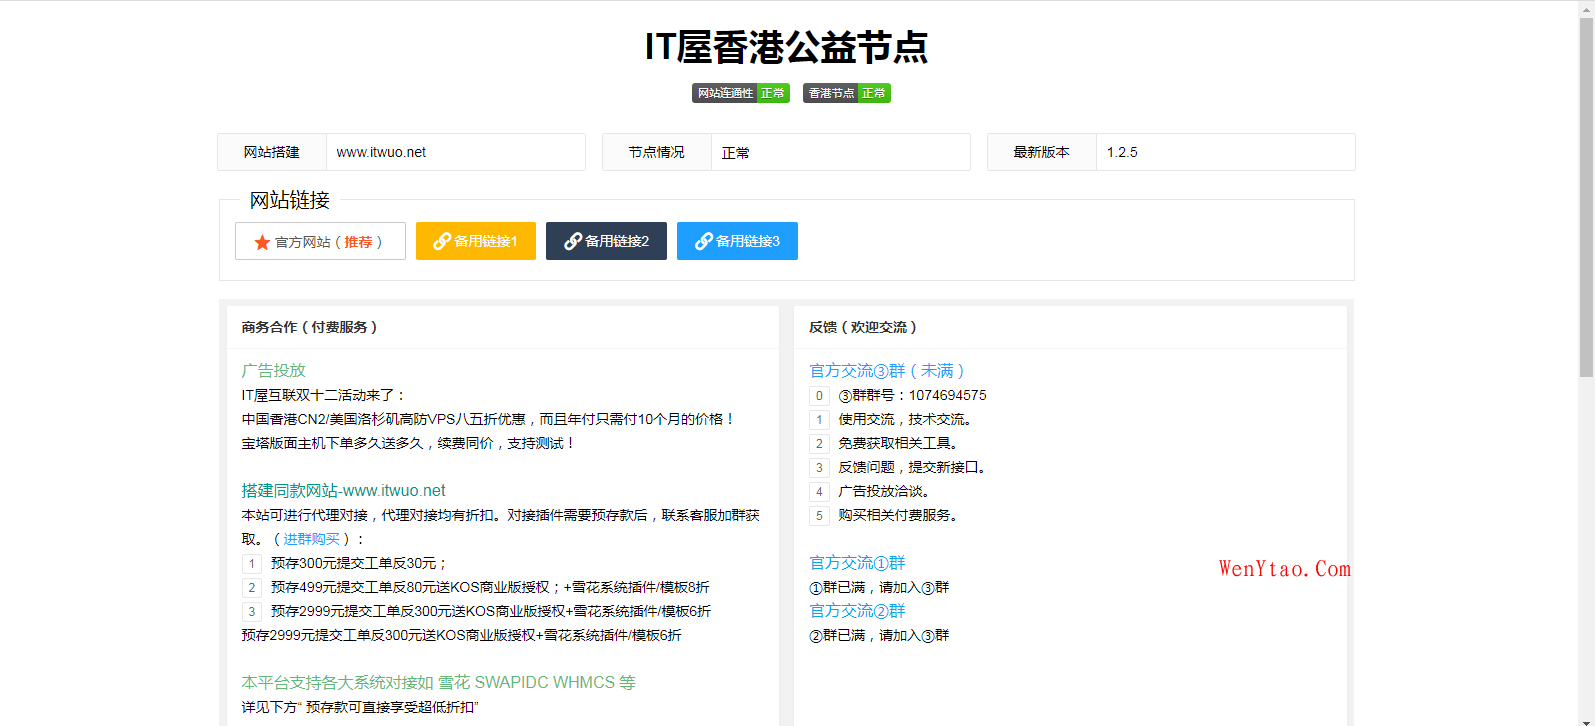 IP默认页HTML源码分享,IP默认页HTML源码分享 第1张,第1张